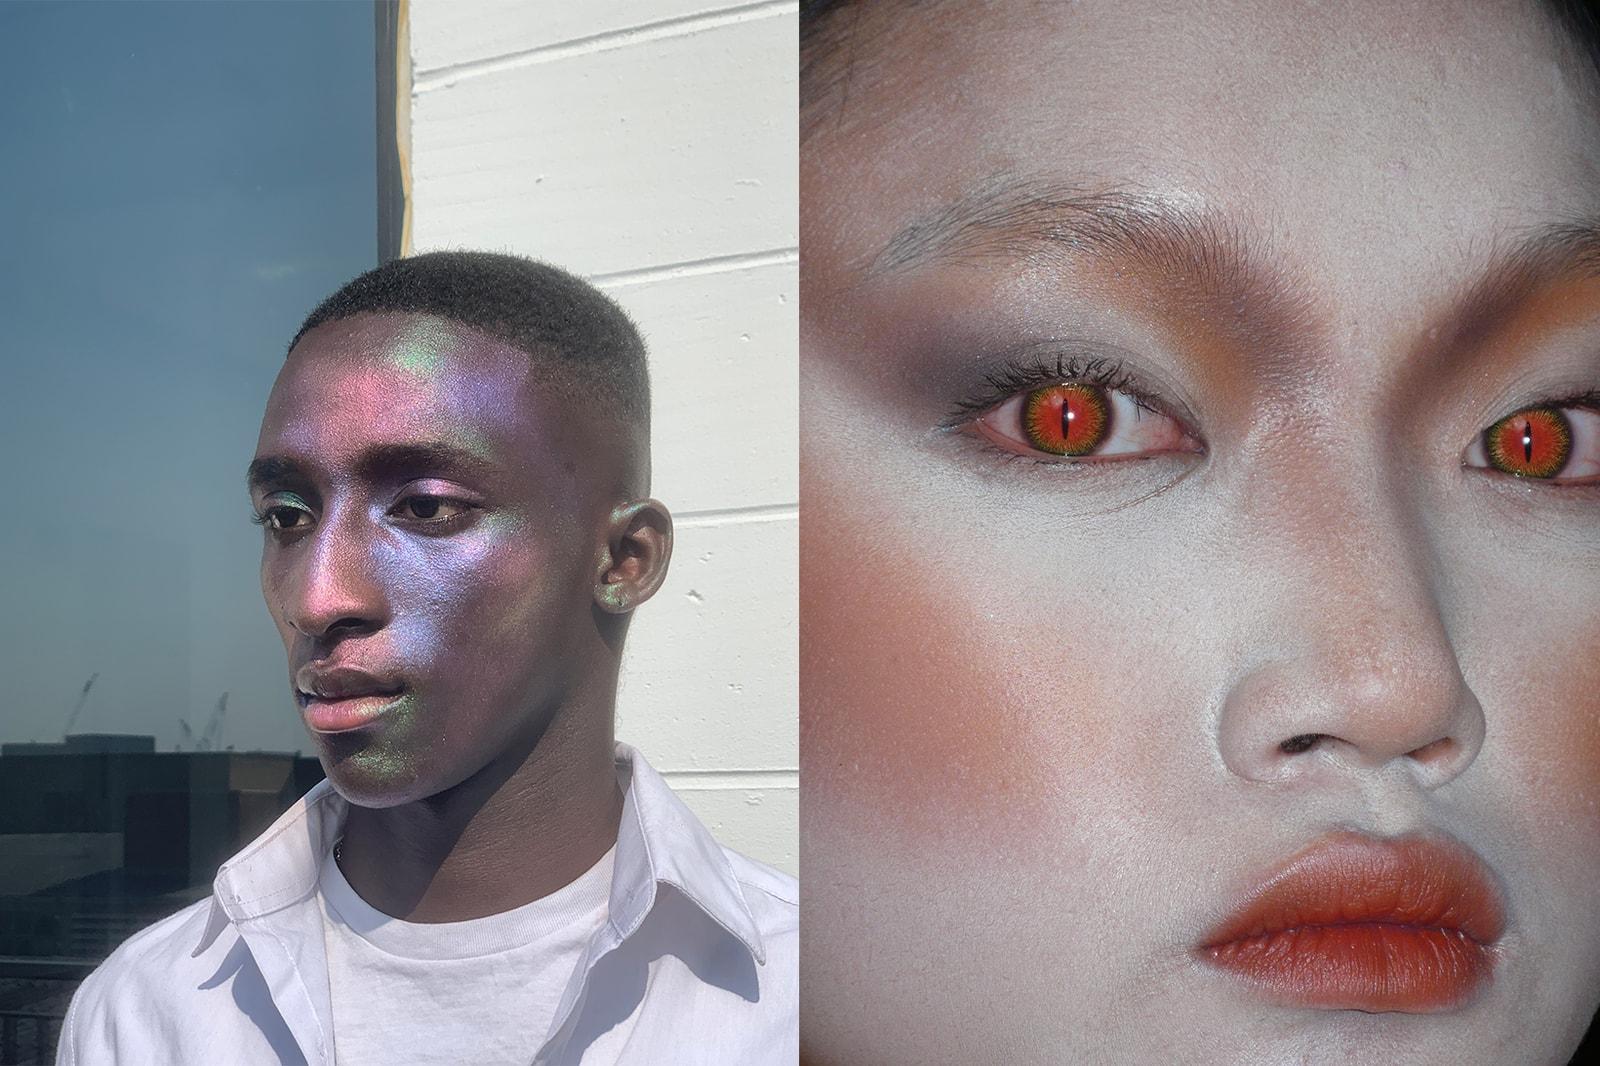 ana takahashi makeup artist beauty london uk art